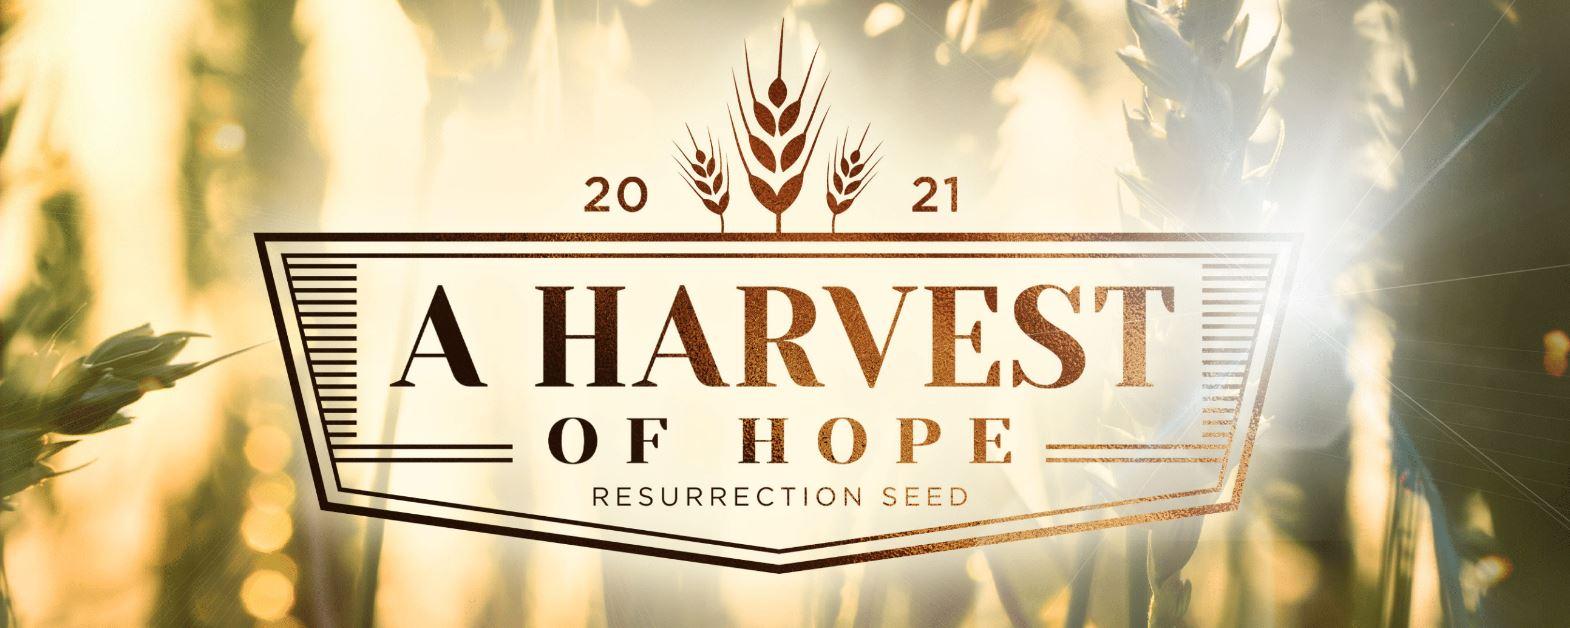 Resurrection Seed 2021: A Harvest of Hope